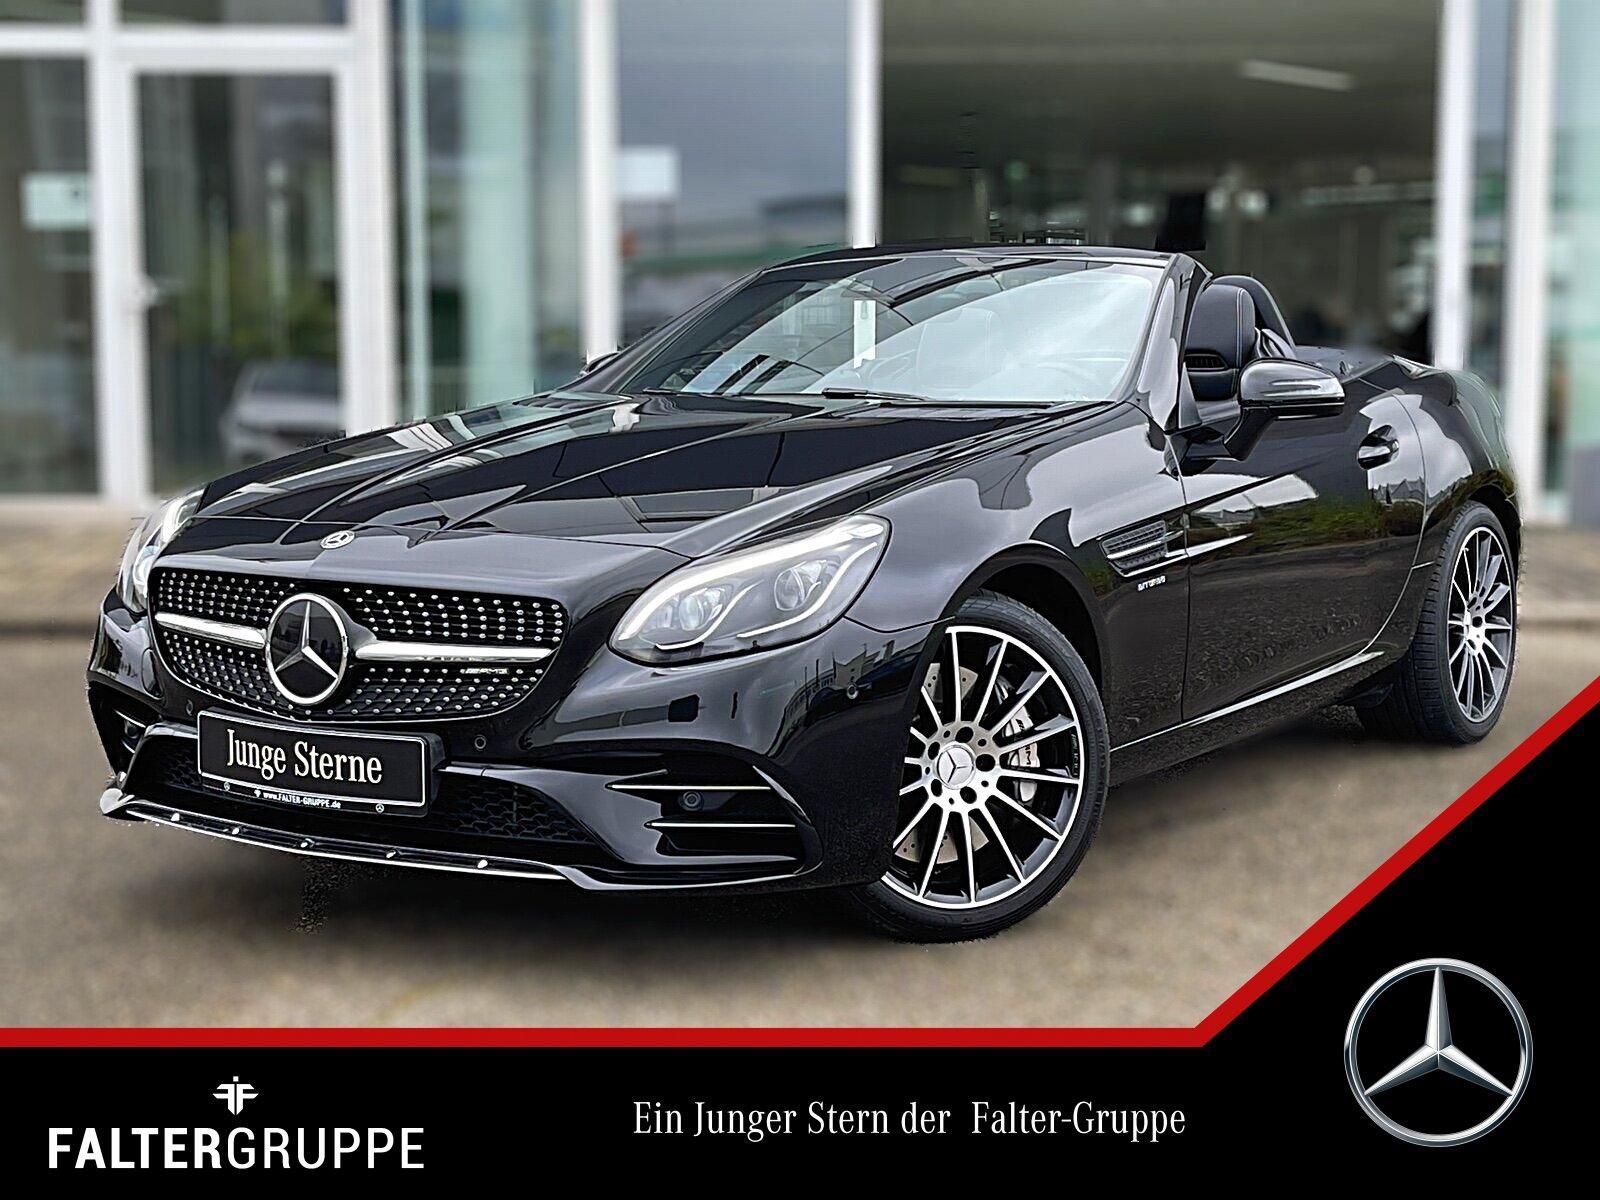 Mercedes-Benz SLC 43 AMG NP 79.944+DISTRO+COMAND+SOUND+MEMORY, Jahr 2018, Benzin